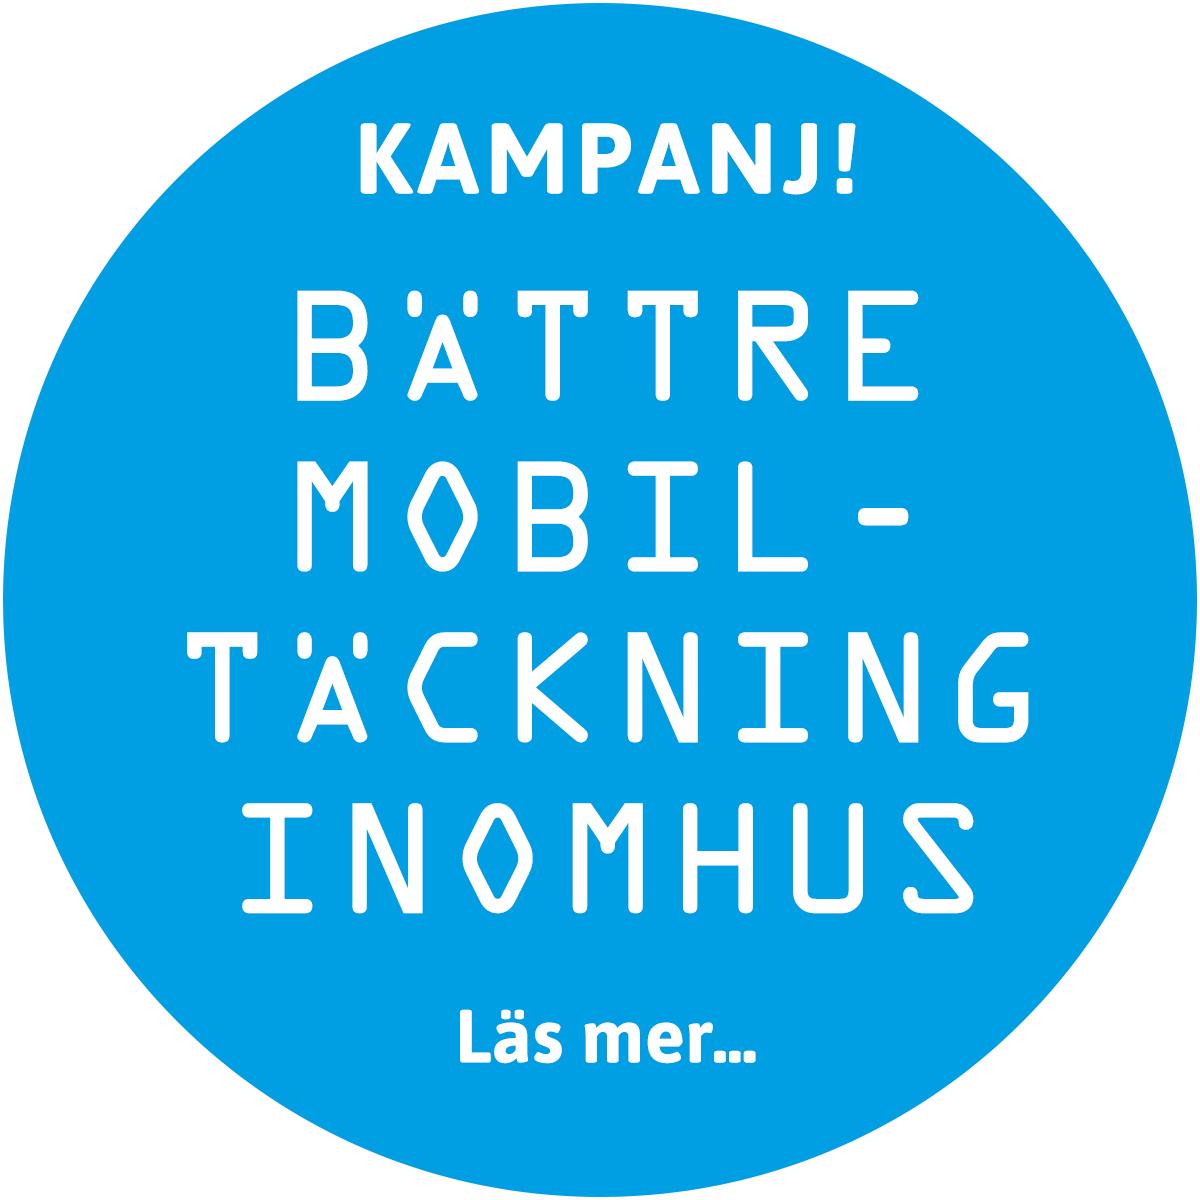 kampanj